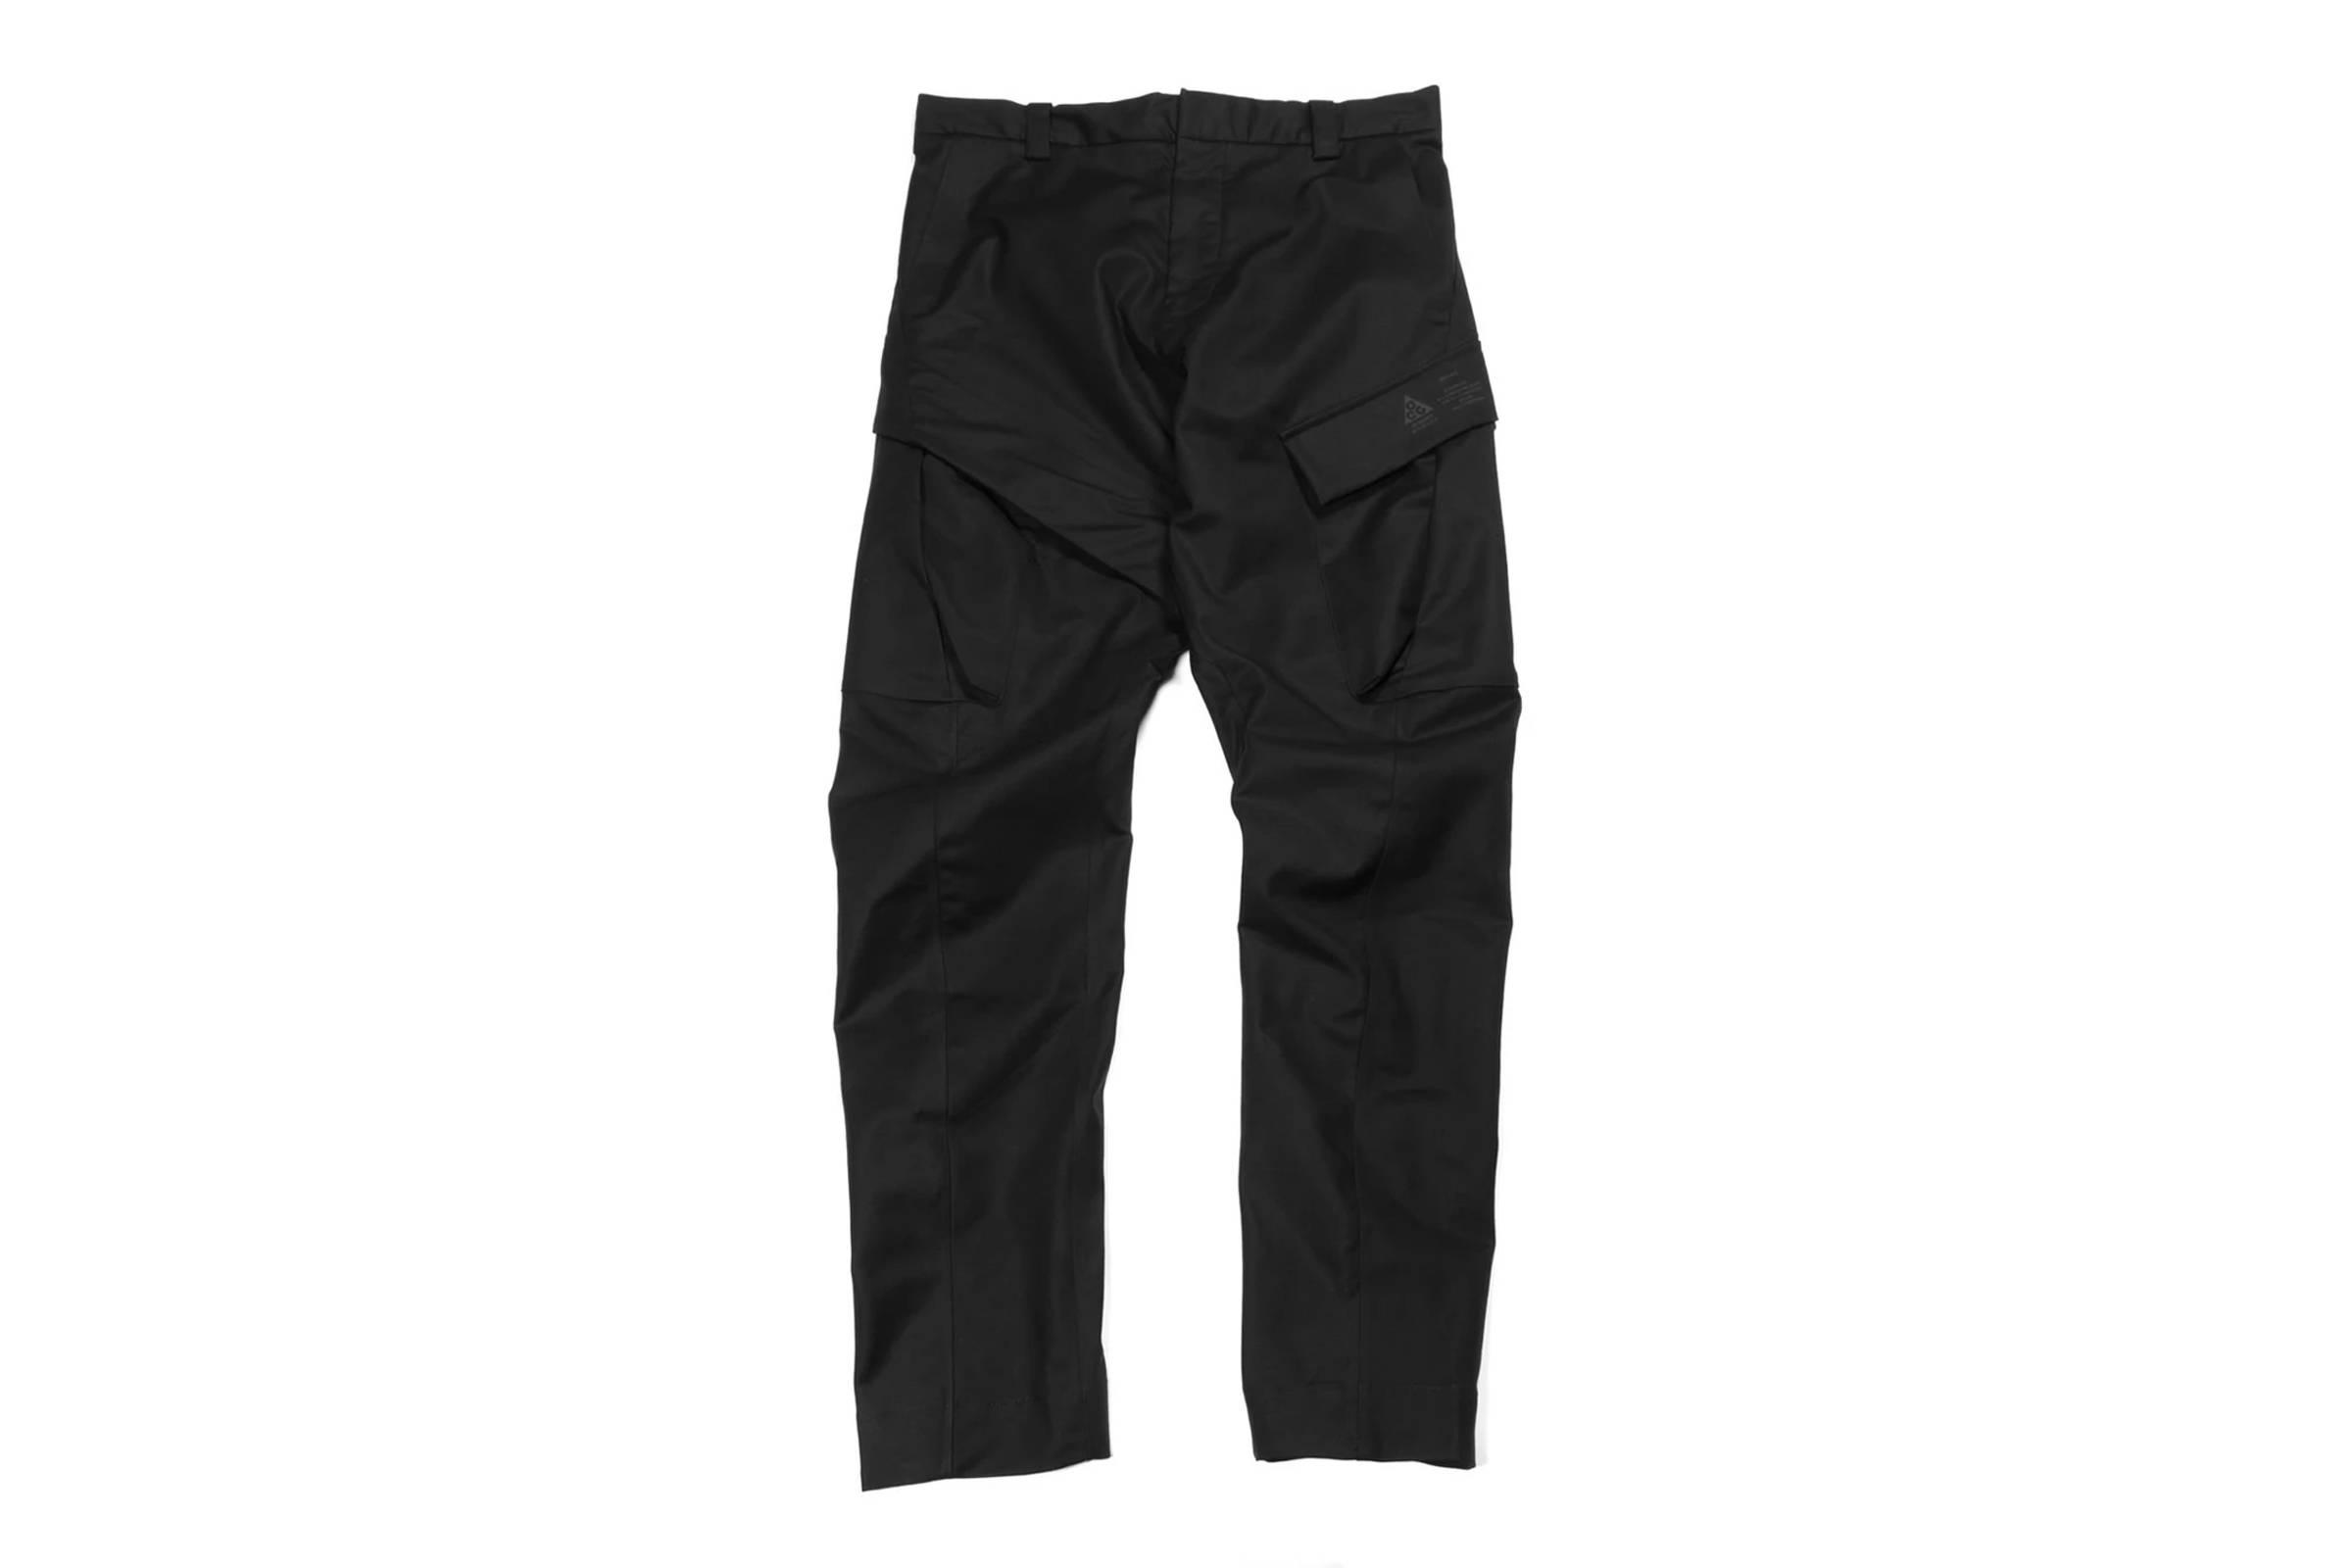 NikeLab ACG Cargo Pant